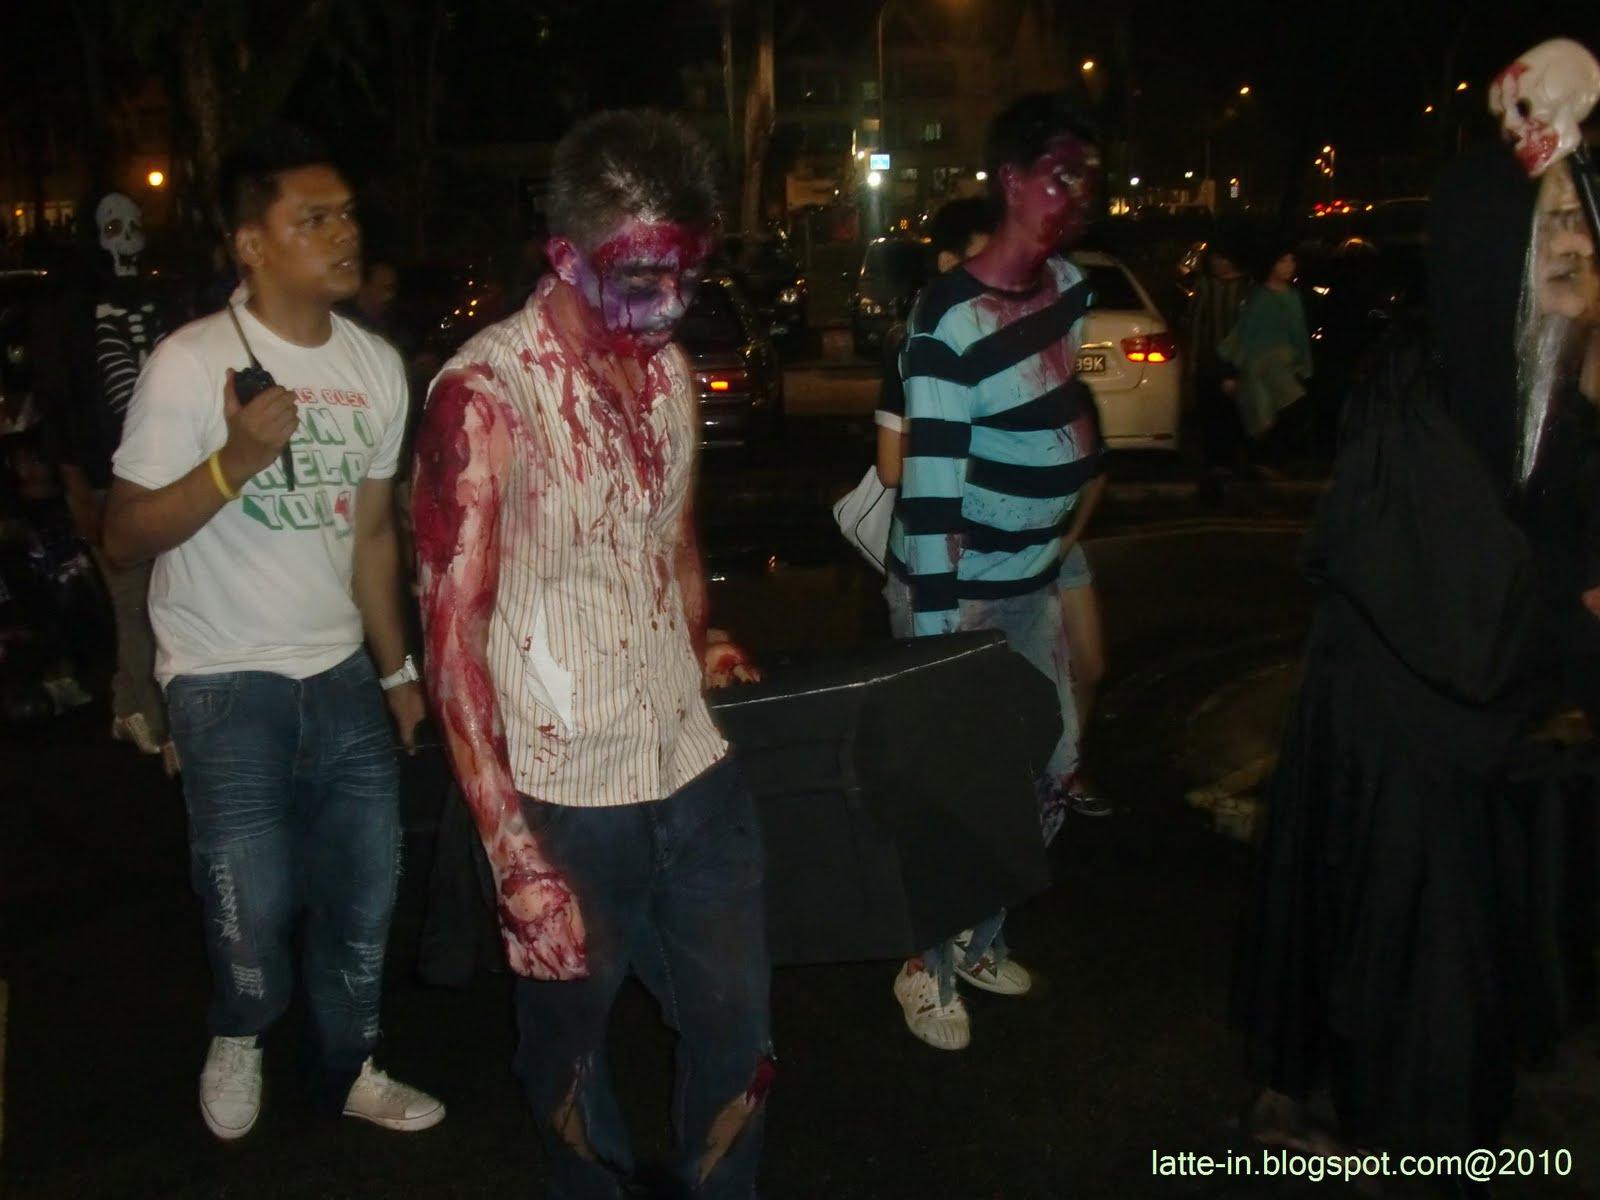 Halloween Party 2010, Escape Themepark Singapore | Take @ Break